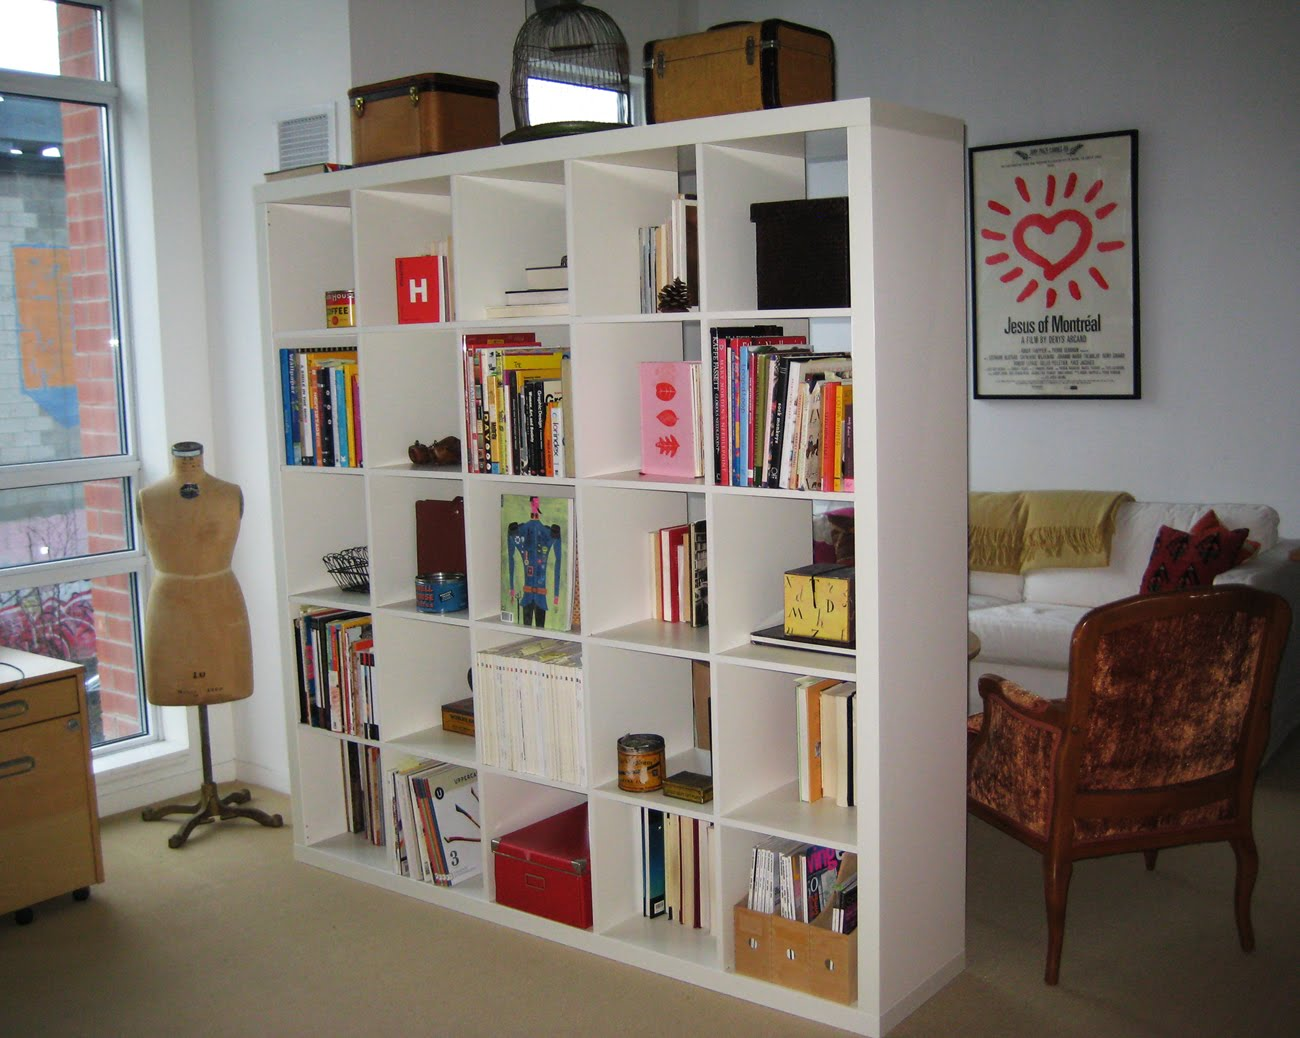 wall2wall ny tips bookshelf room divider sample designs. Black Bedroom Furniture Sets. Home Design Ideas